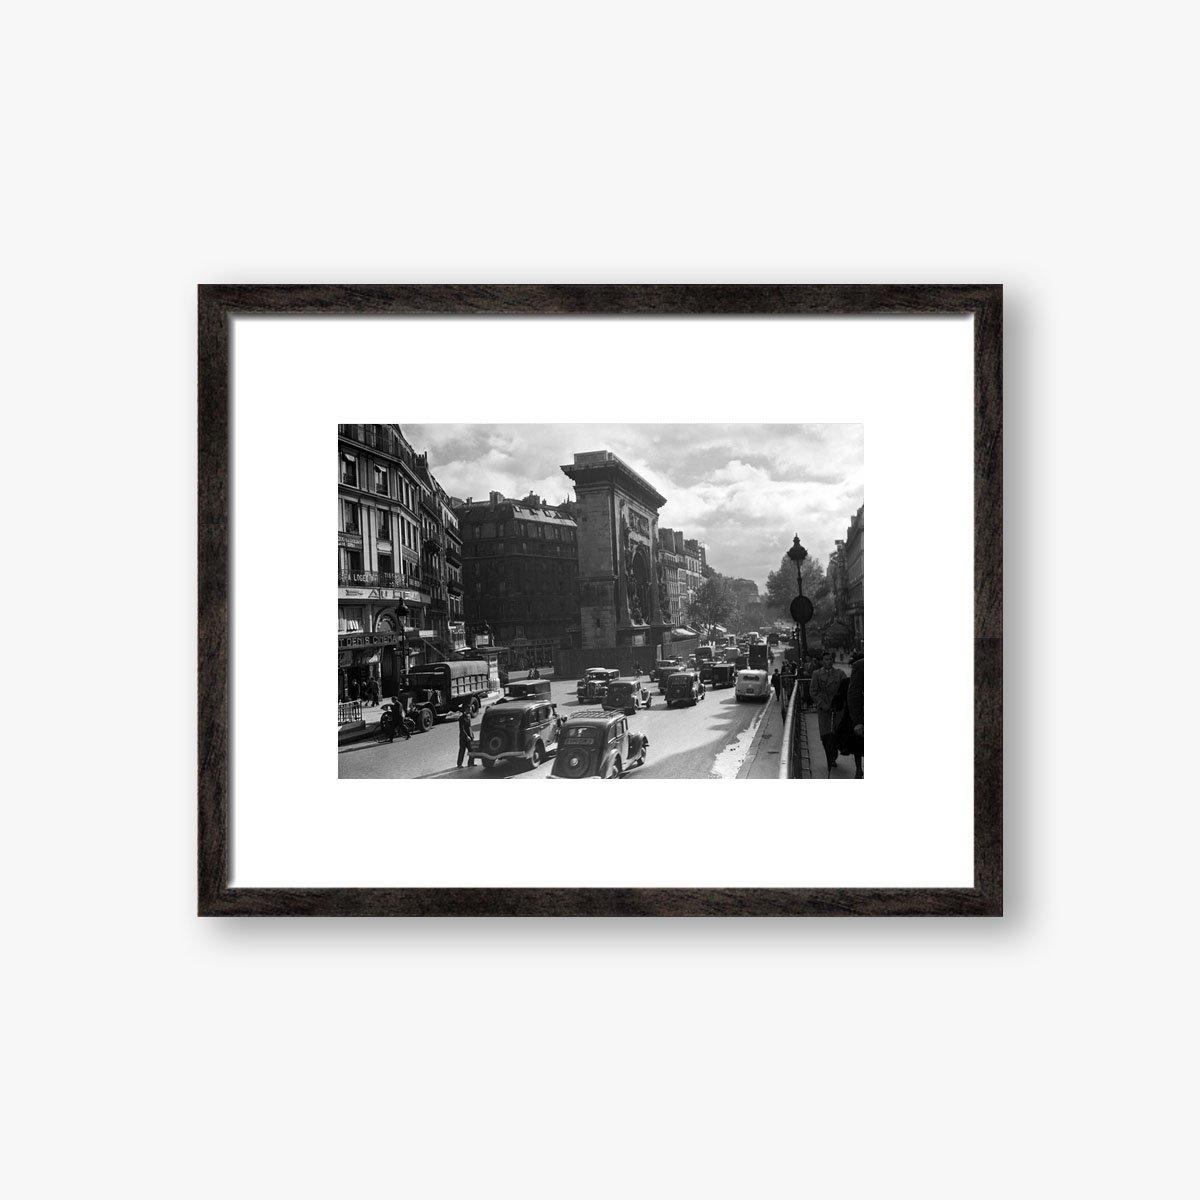 Boulevard St Martin Paris by Frank Rust